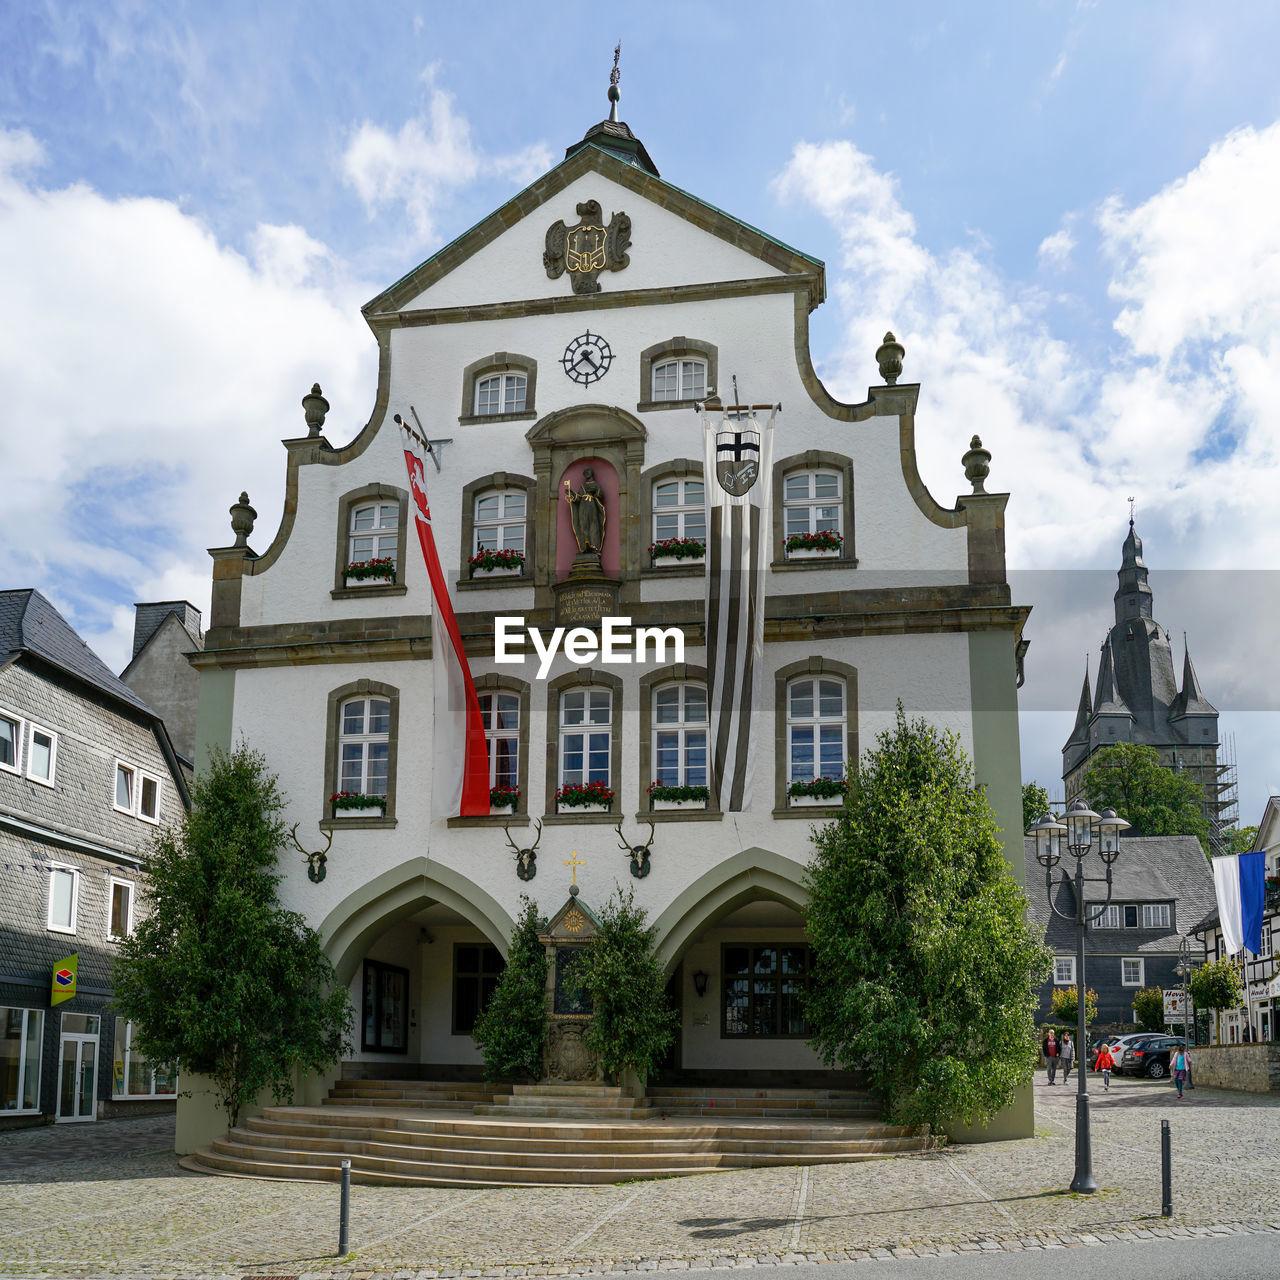 Brilon, north rhine westphalia germany  june 2018 brilon city hall decorated with flags.